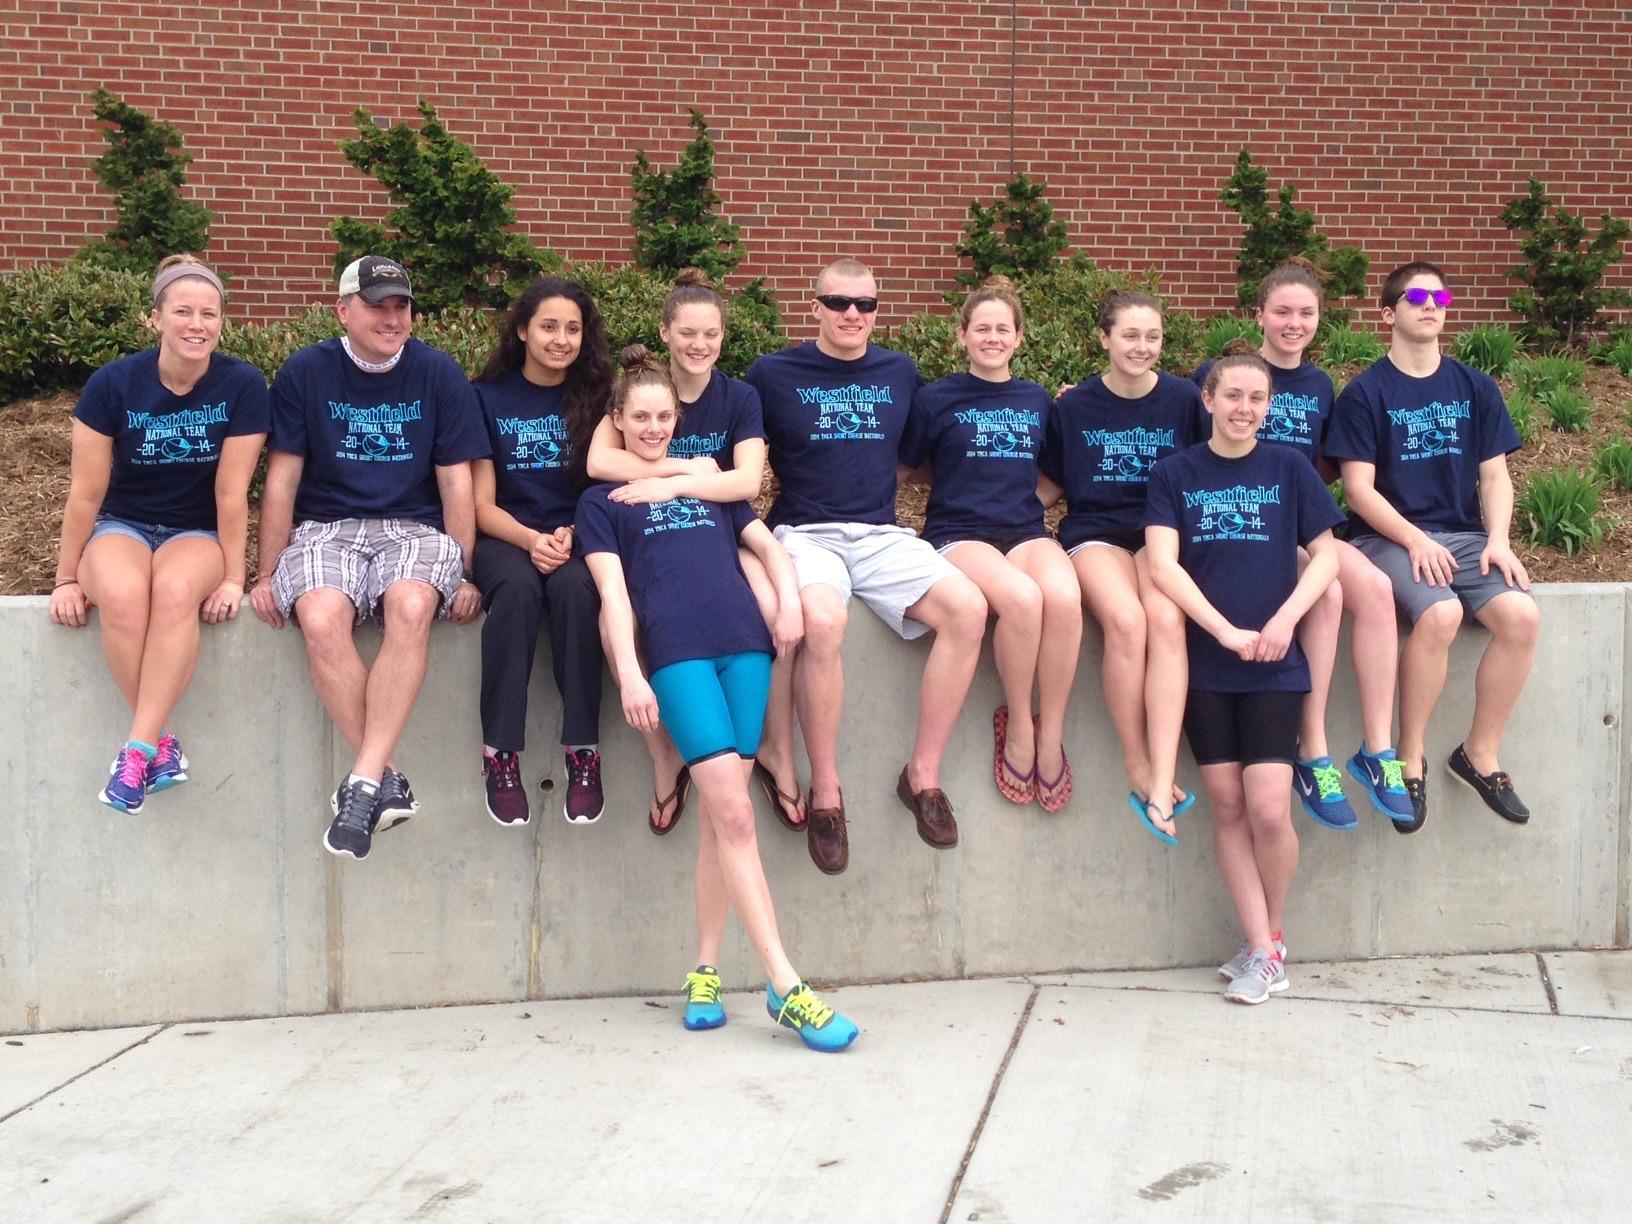 c401cc15e51abdaaa854_Swimteam_2014.JPG